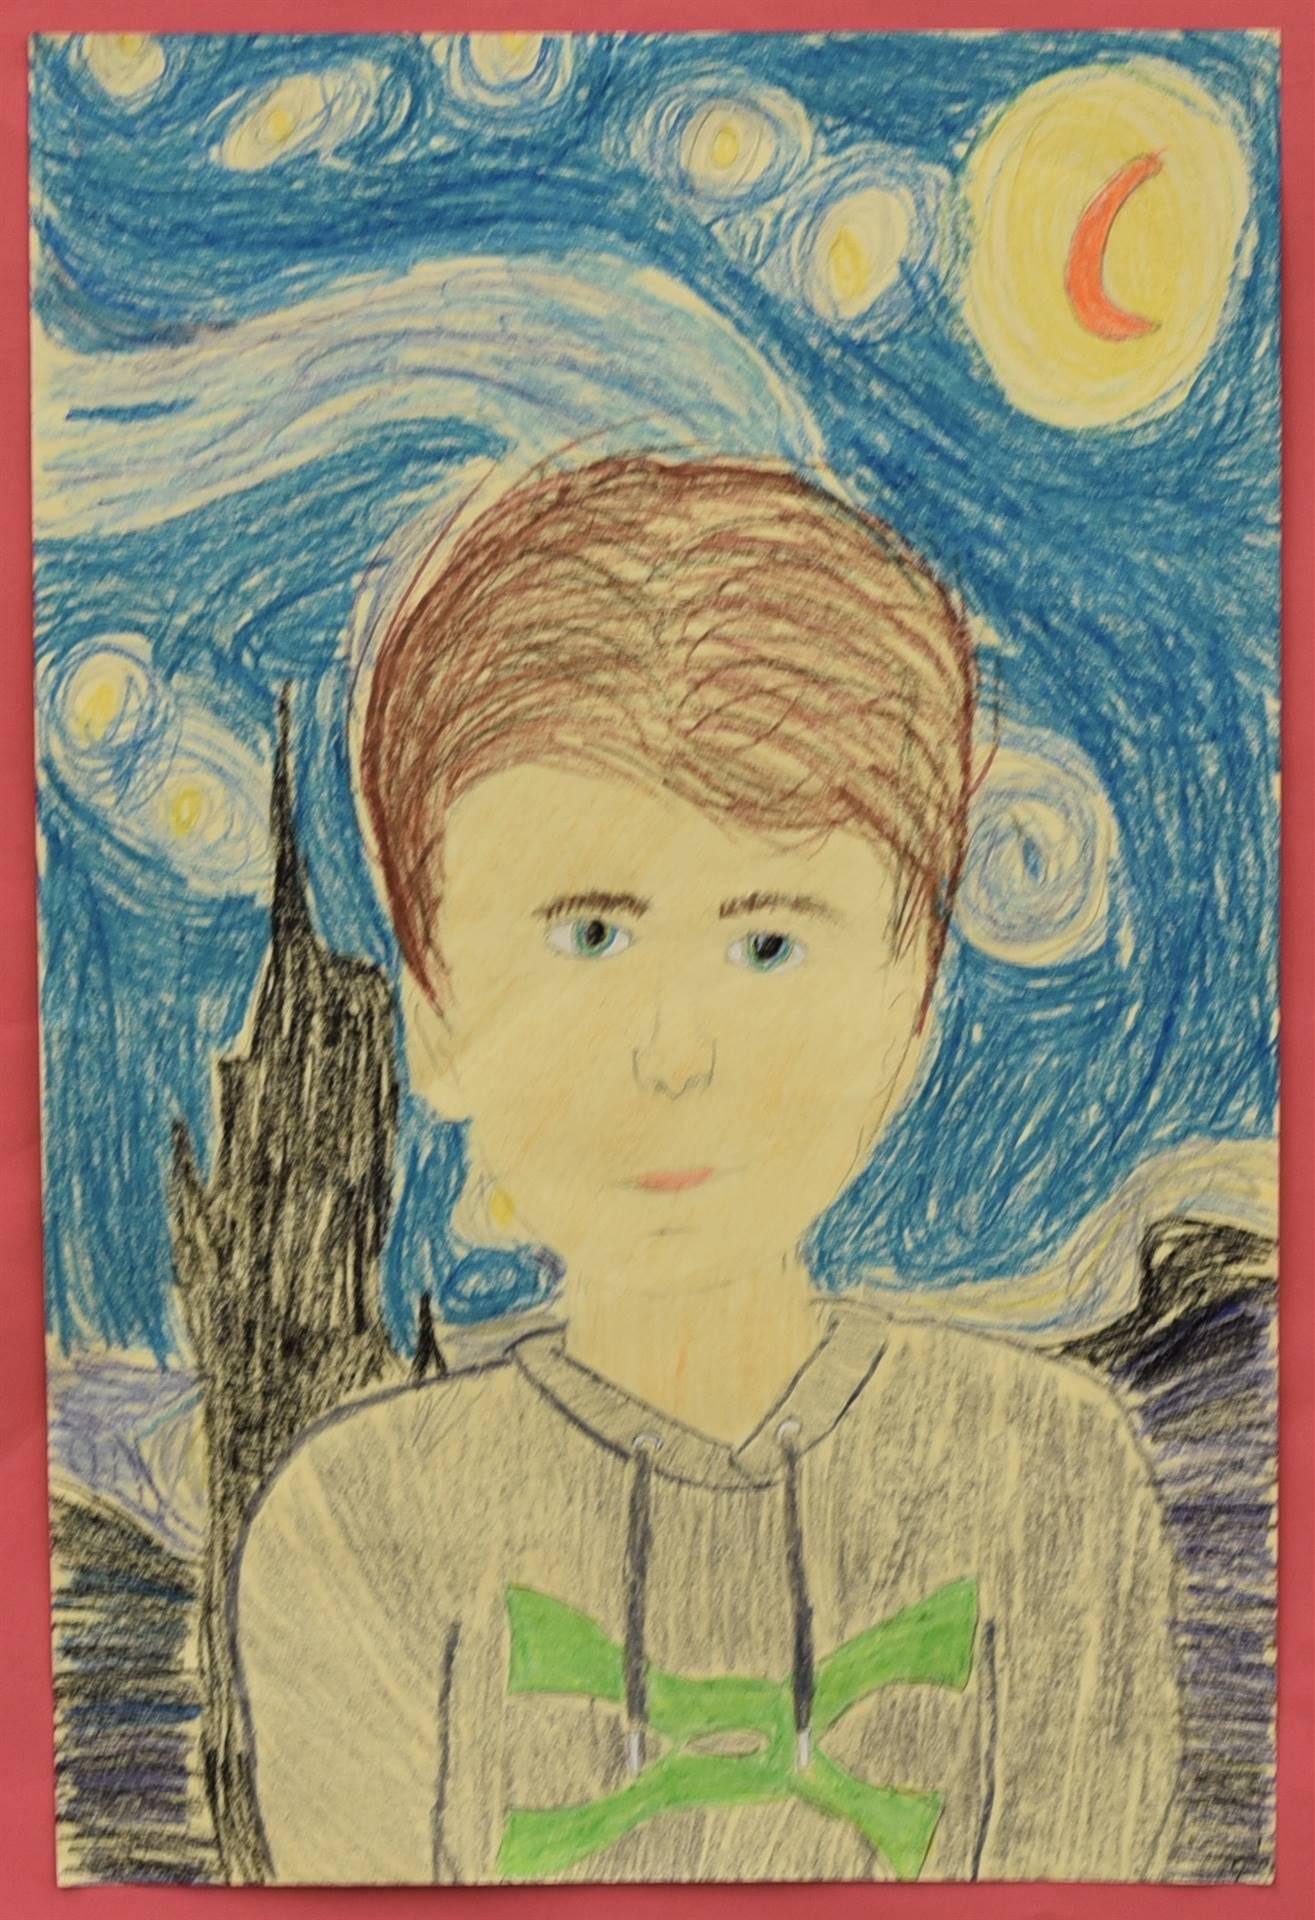 Brecksville-Broadview Hts. Middle School Art Projects 185